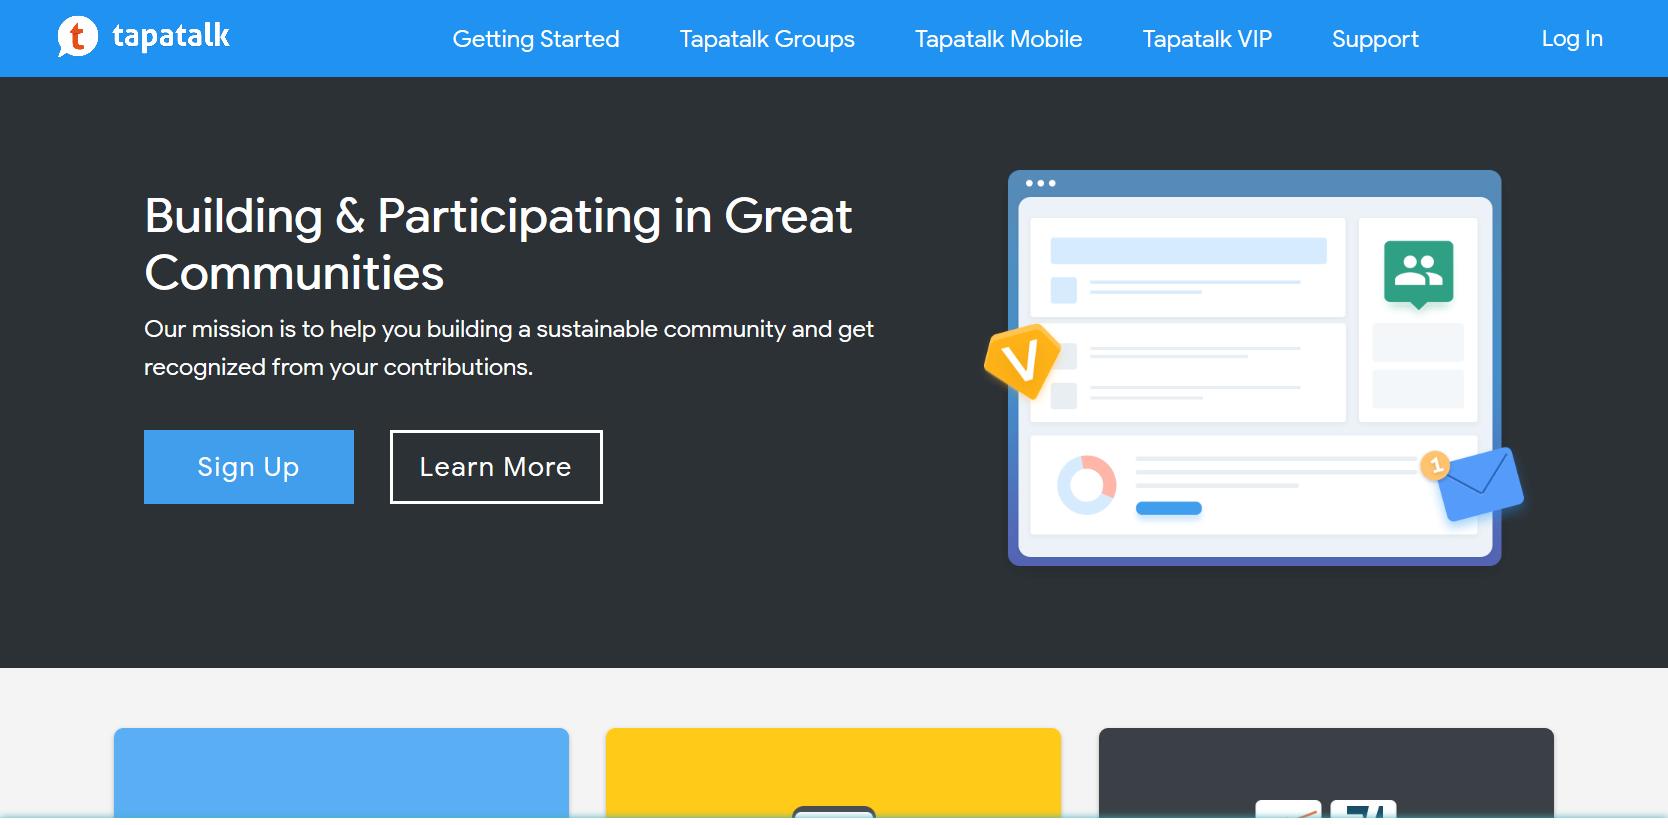 Izveido savu forumu ar Tapatalk